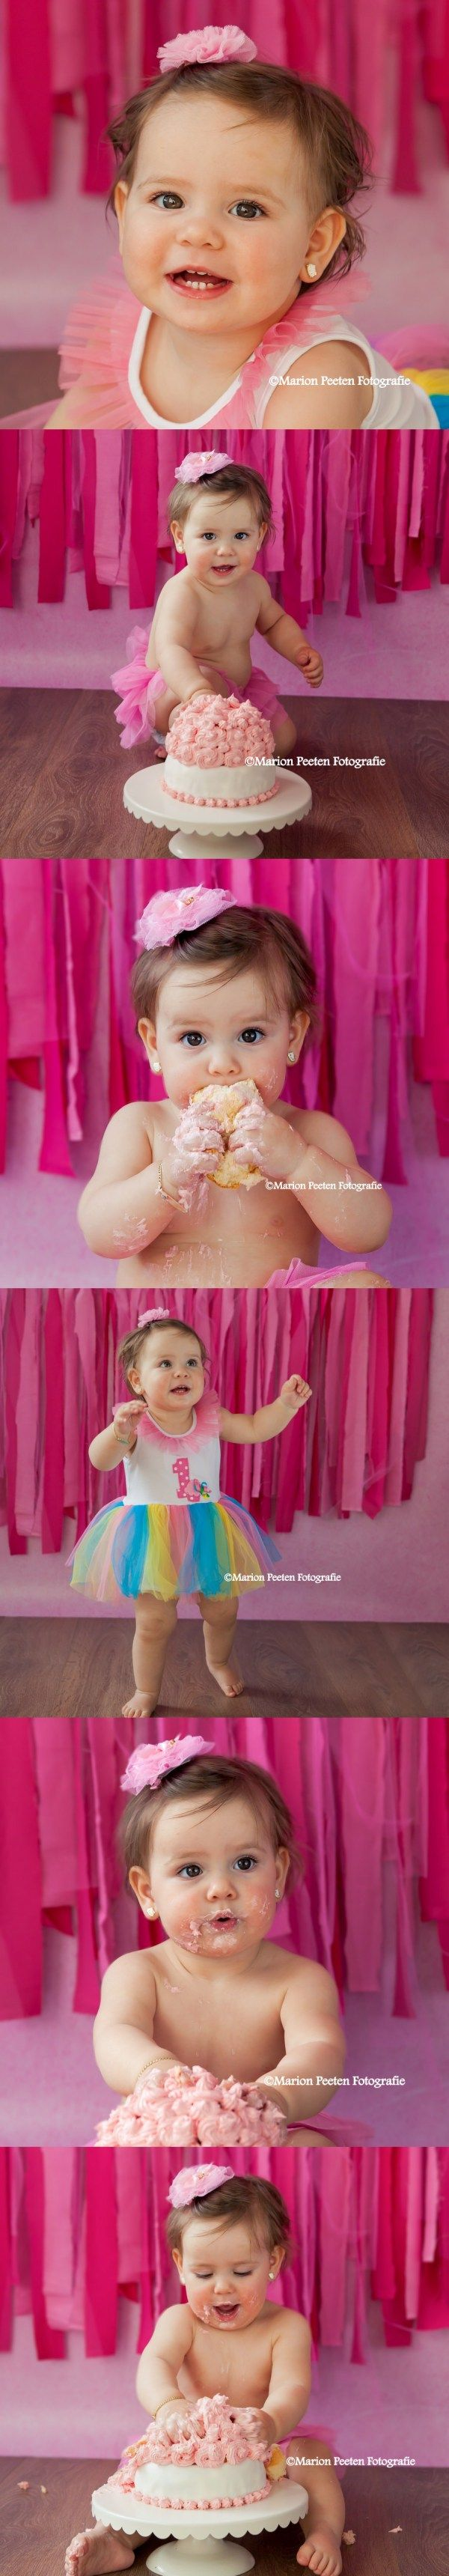 cake smash fotoshoot, verjaardag fotoshoot, birthday shoot, one year shoot,